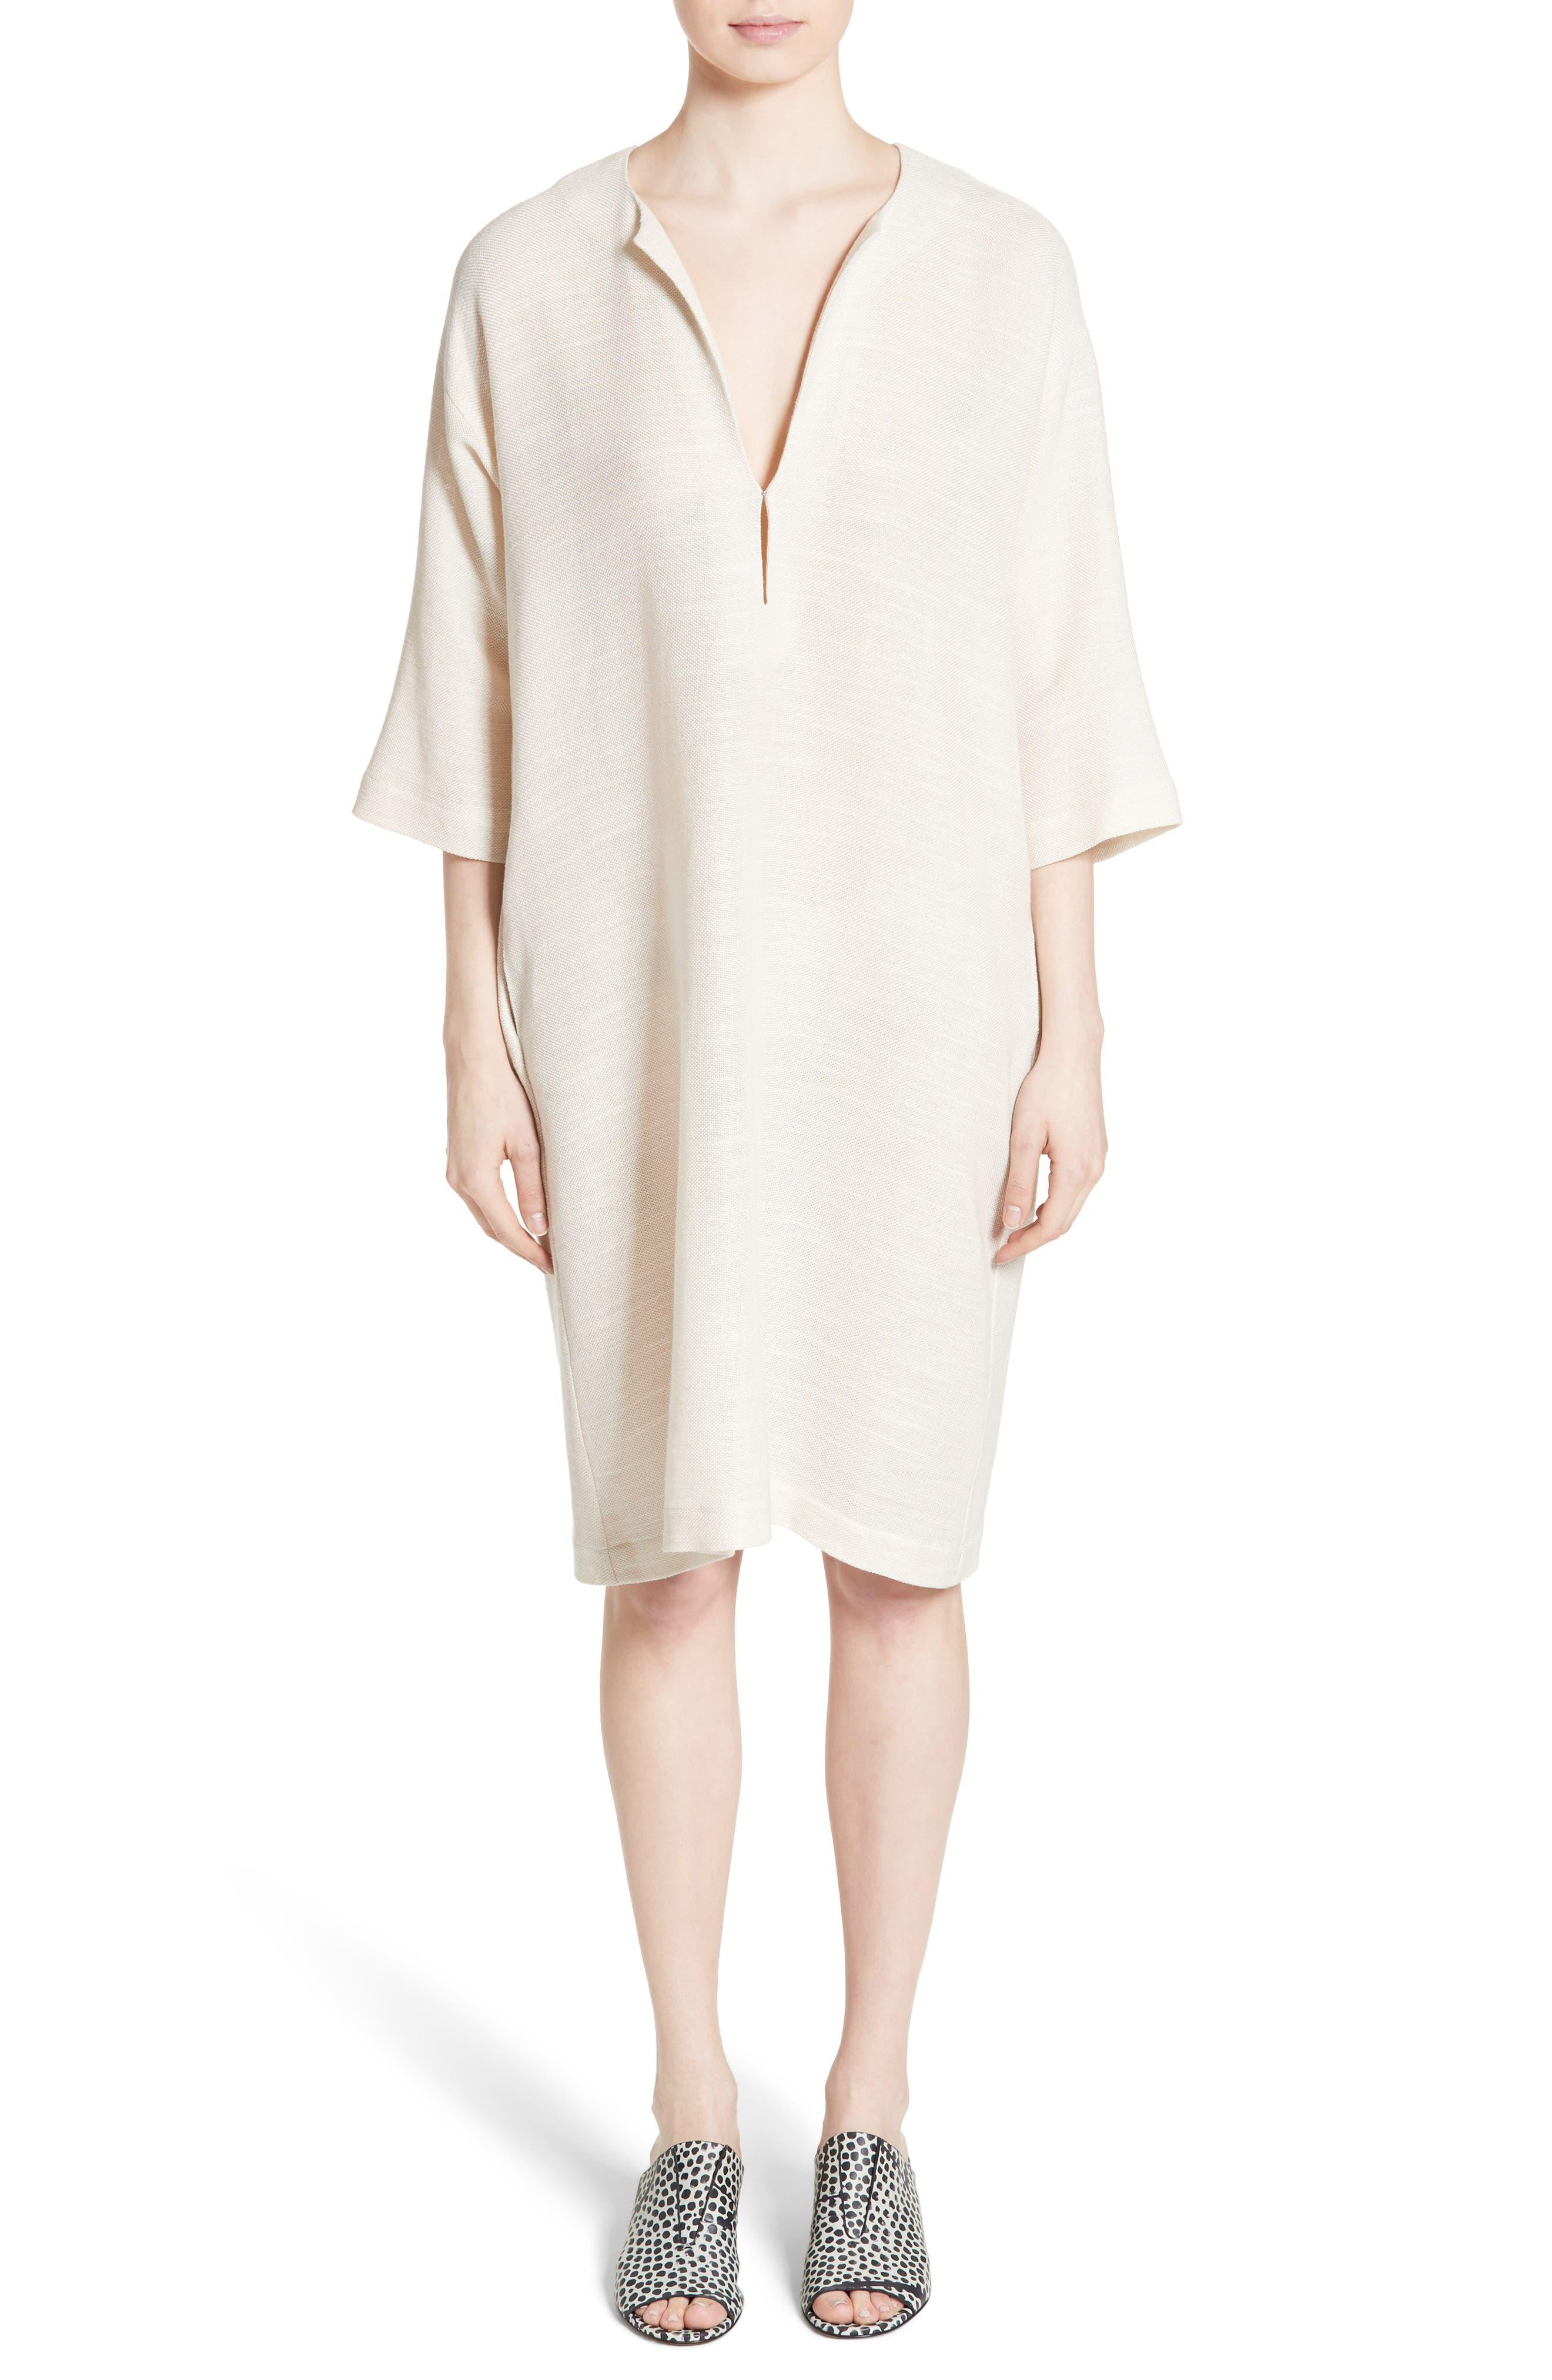 Main Image - Zero + Maria Cornejo MC Mesh Drape Dress